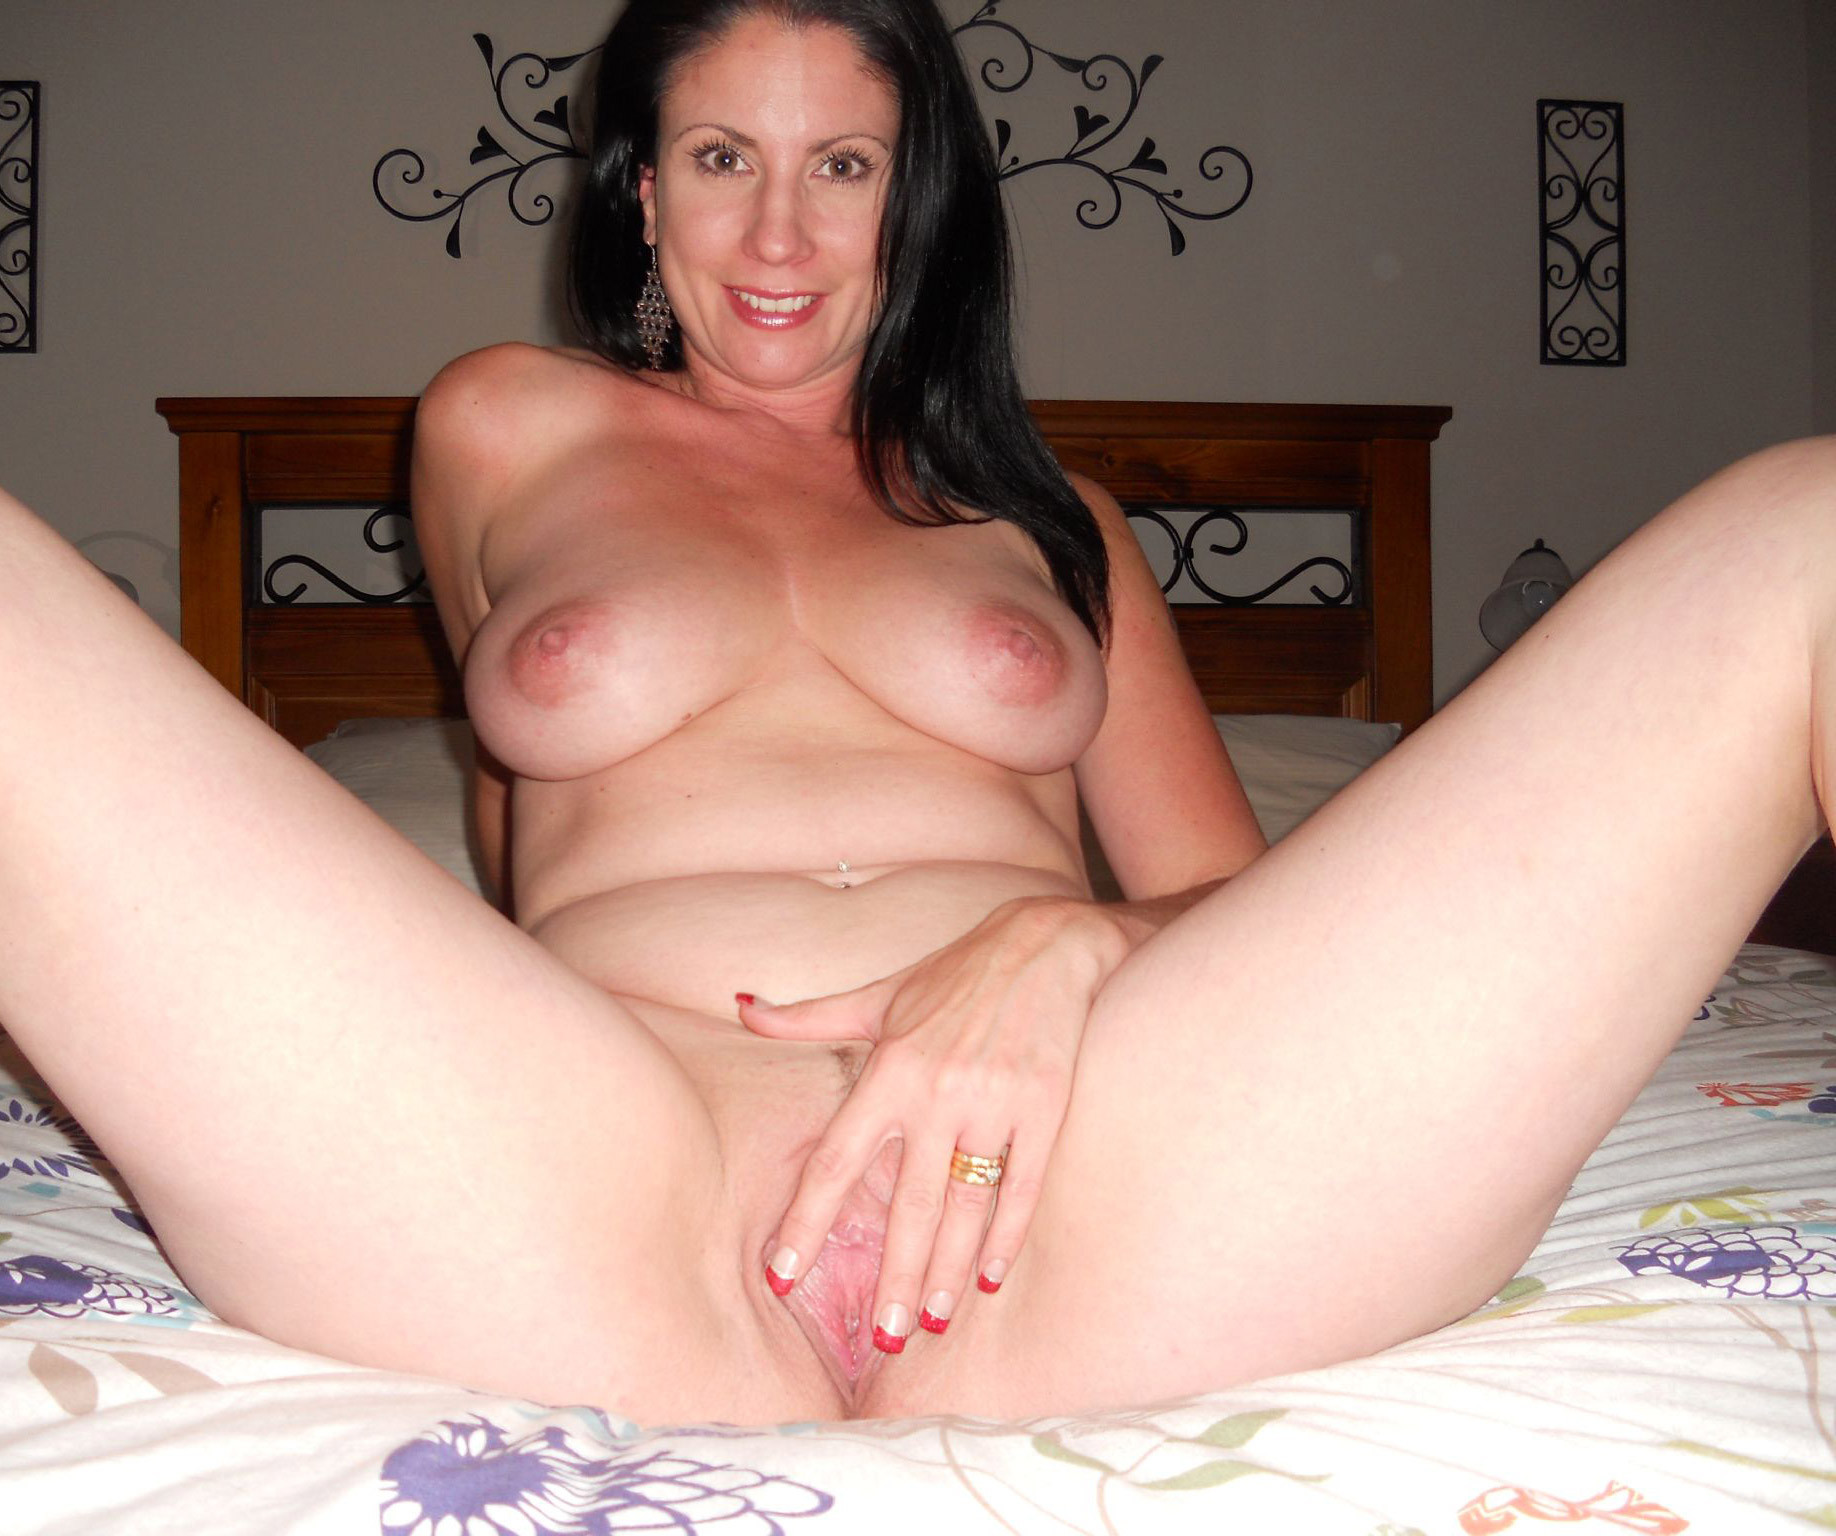 sexe cul site rencontre chaud